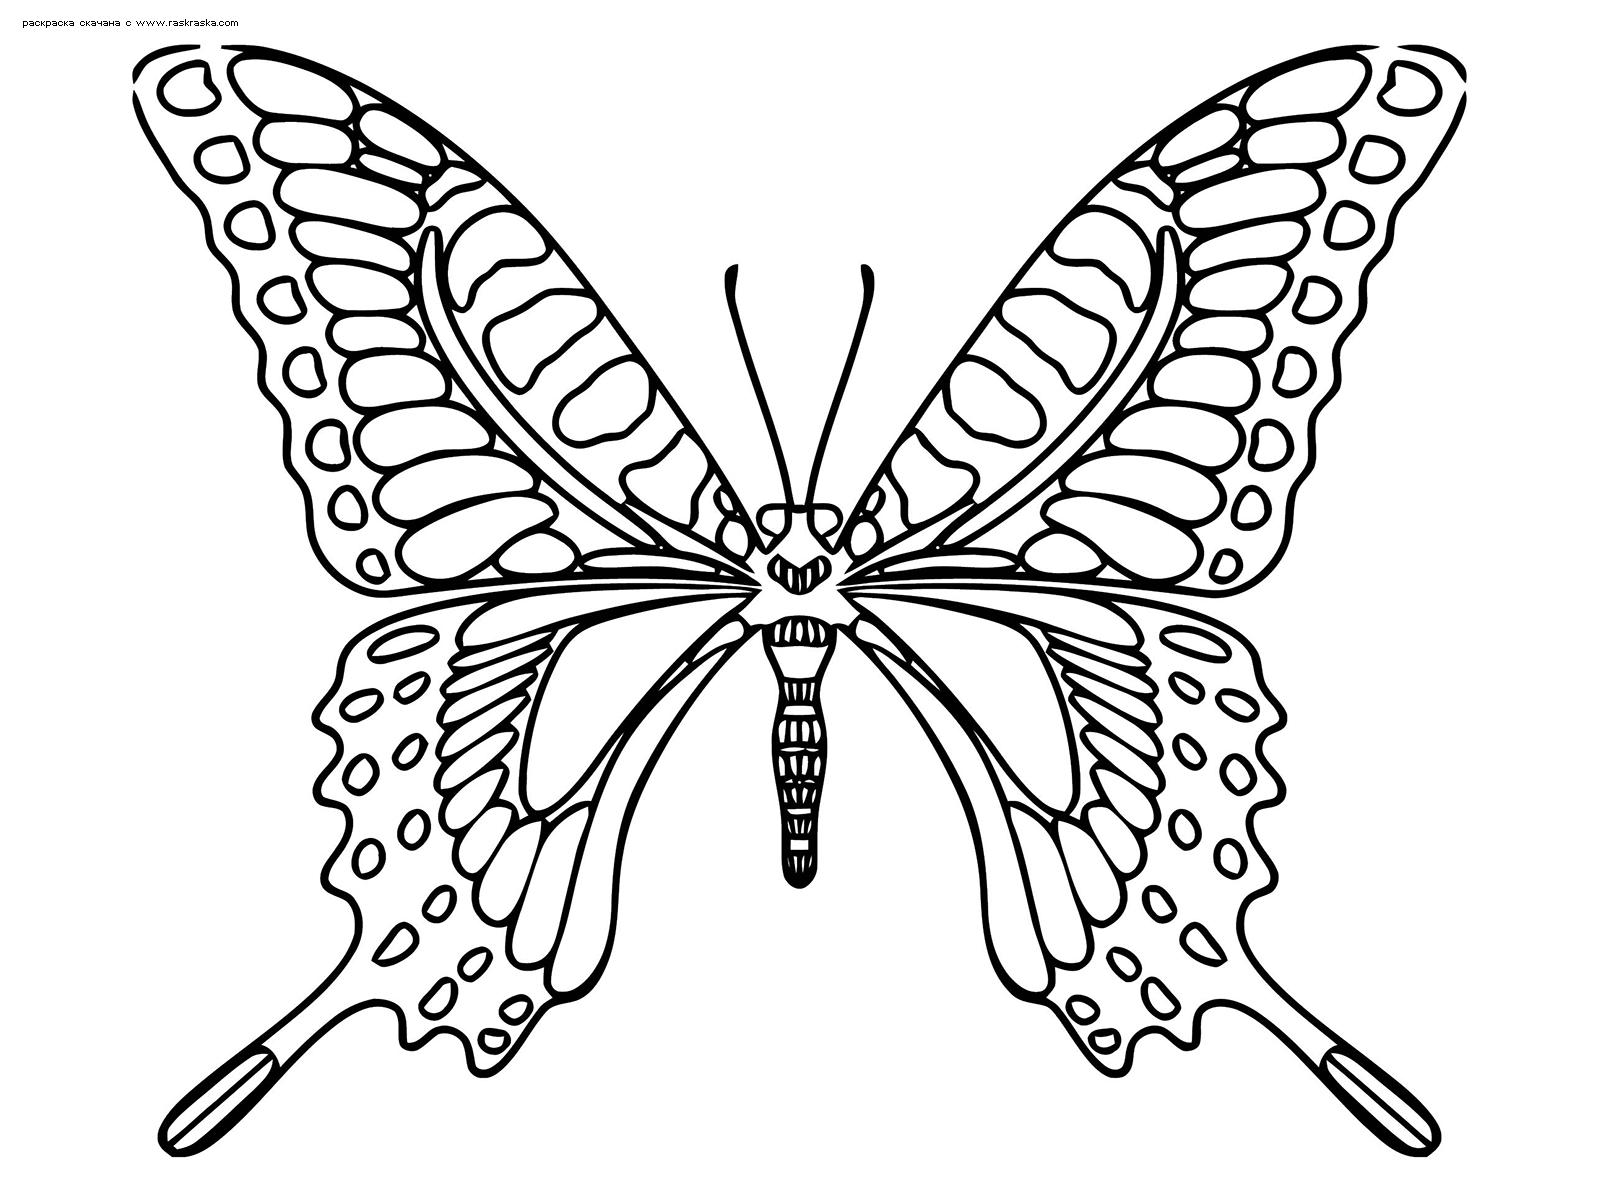 Раскраска Махаон. Раскраска бабочка